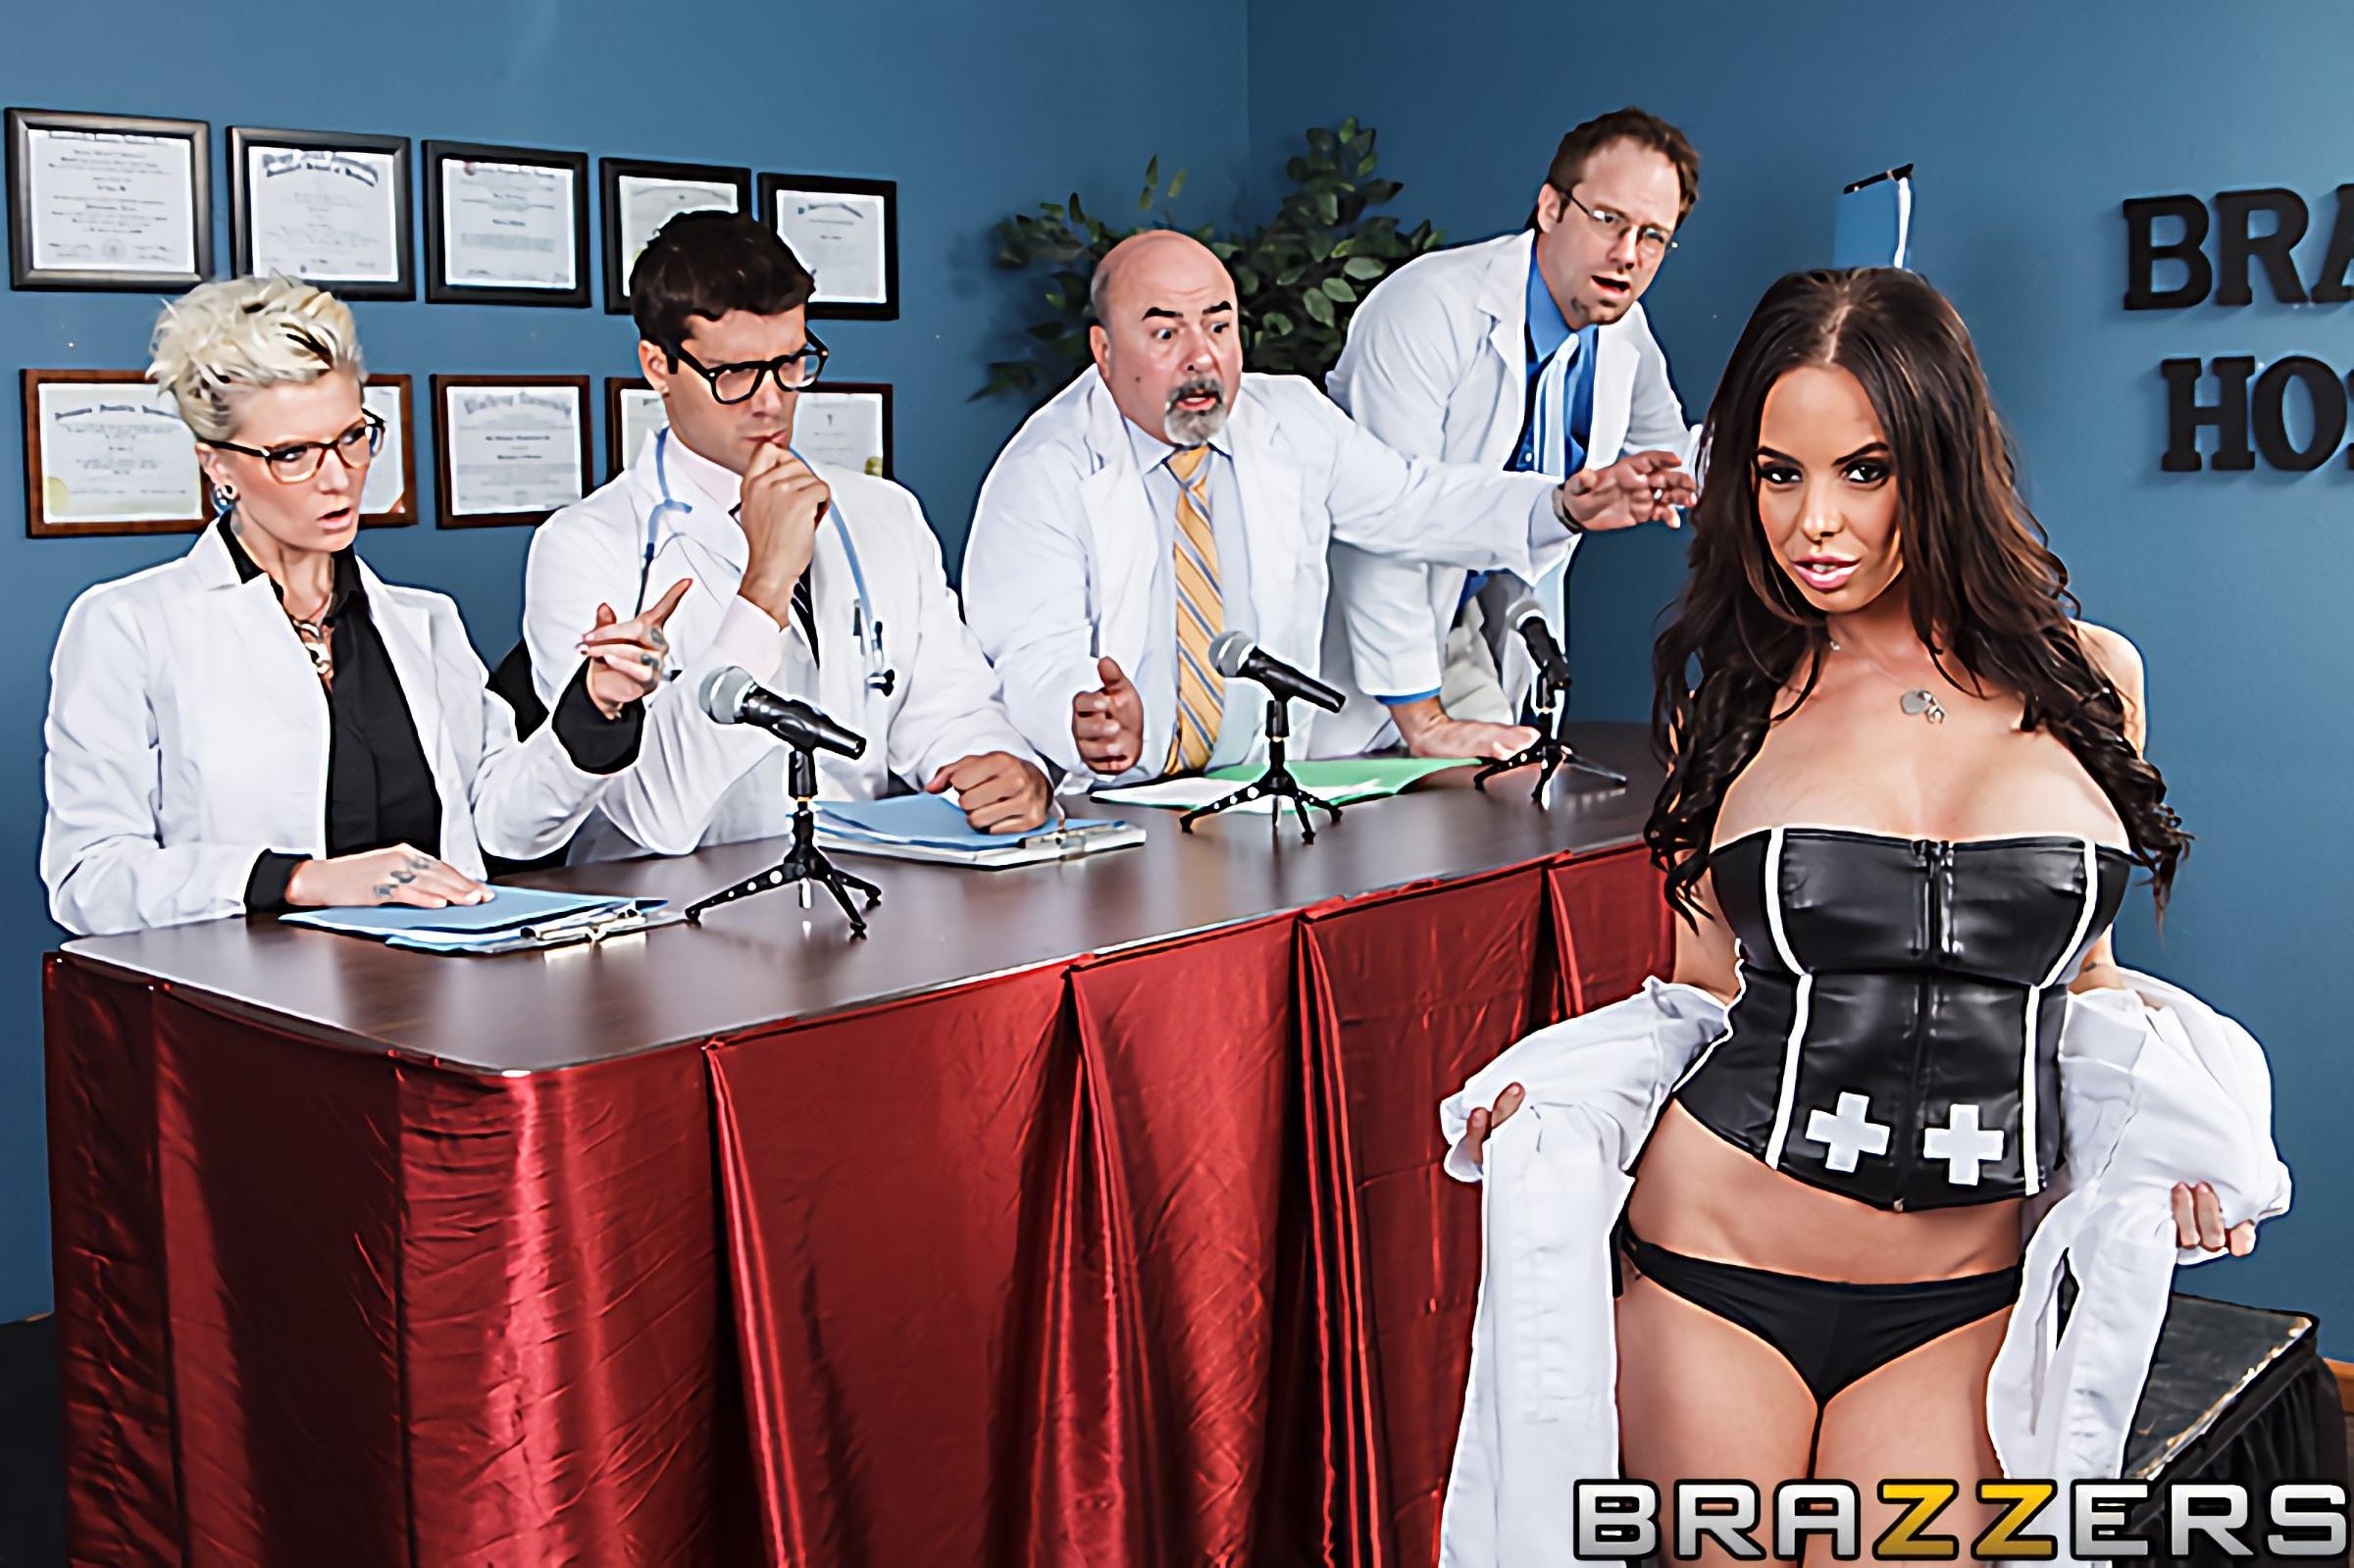 Brazzers 'License To Fuck' starring Brandy Aniston (Photo 2)